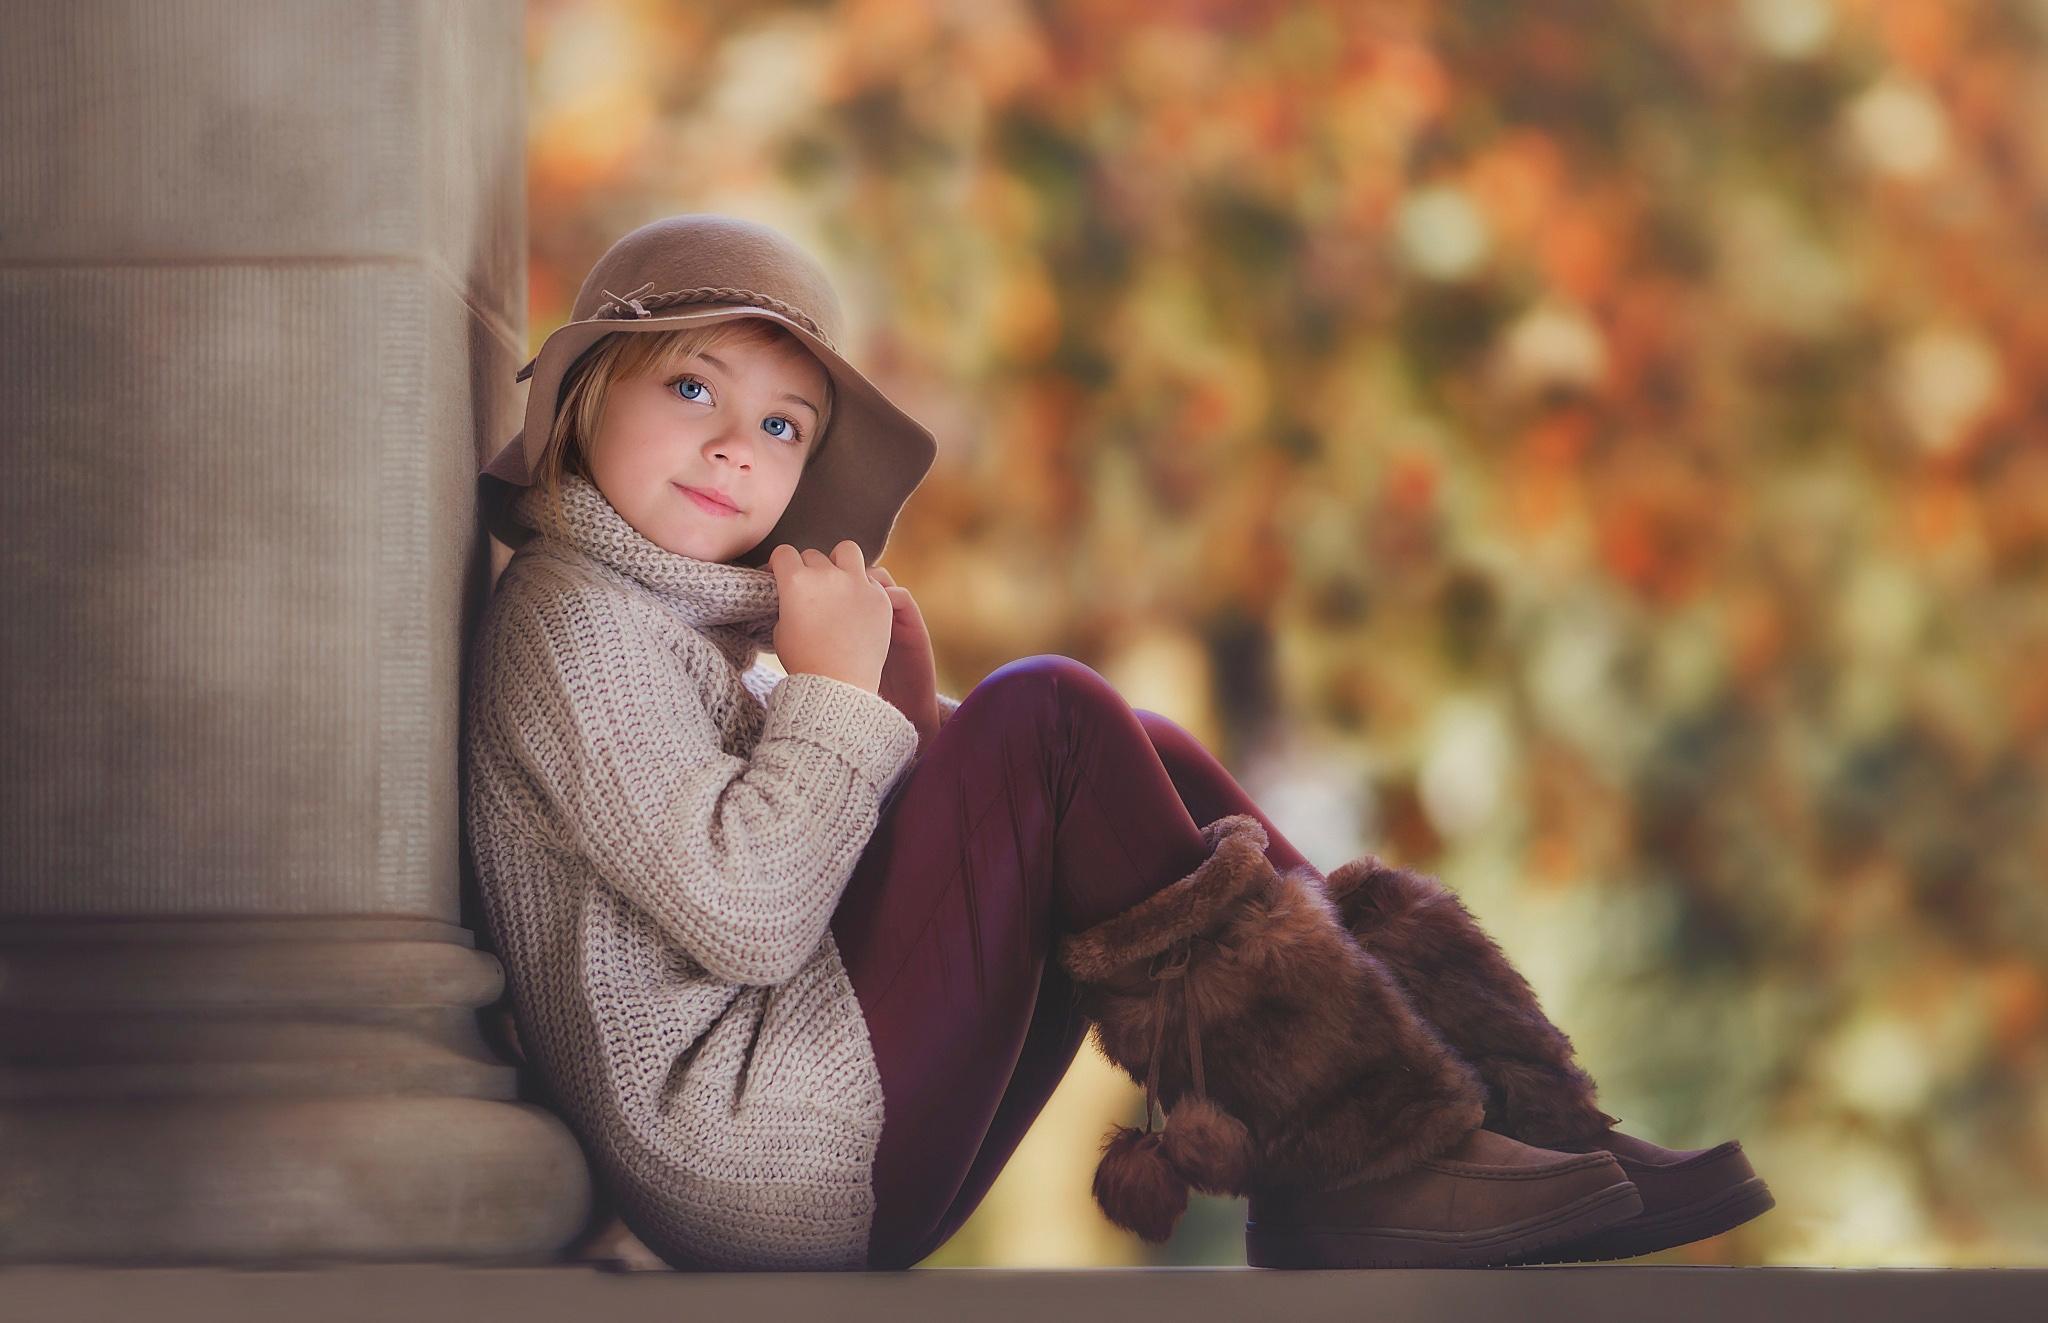 Cute Small Girl Full Hd Wallpaper صور بنات صغار 2016 جميلة ورقيقة احلي بنات صغيرة سوبر كايرو